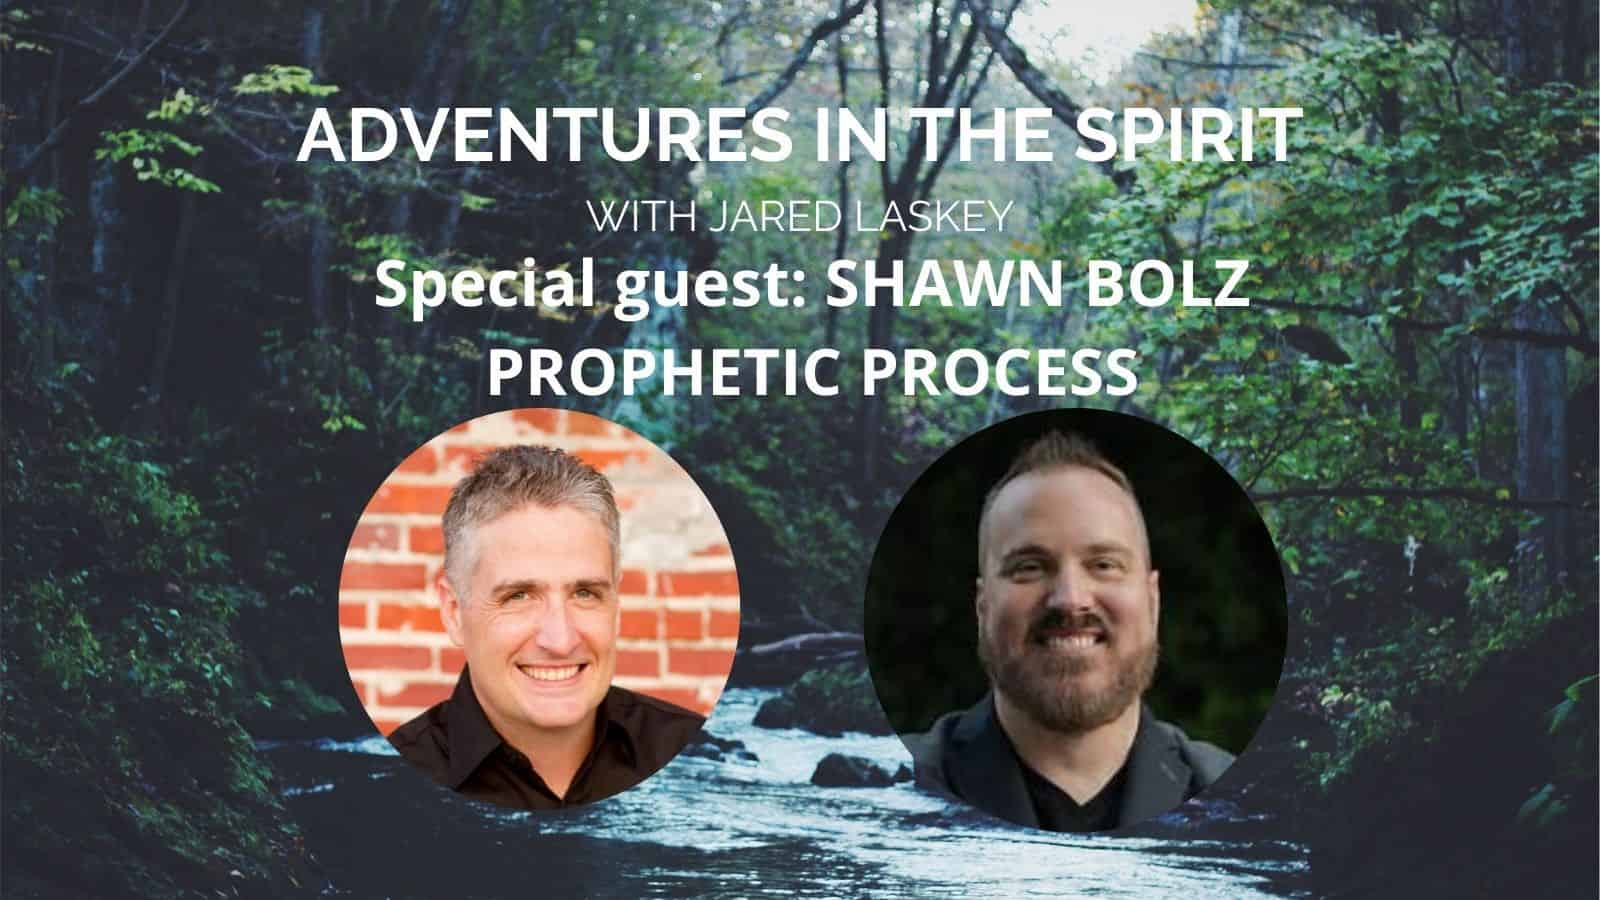 Learn How to Hear God's Voice with Shawn Bolz